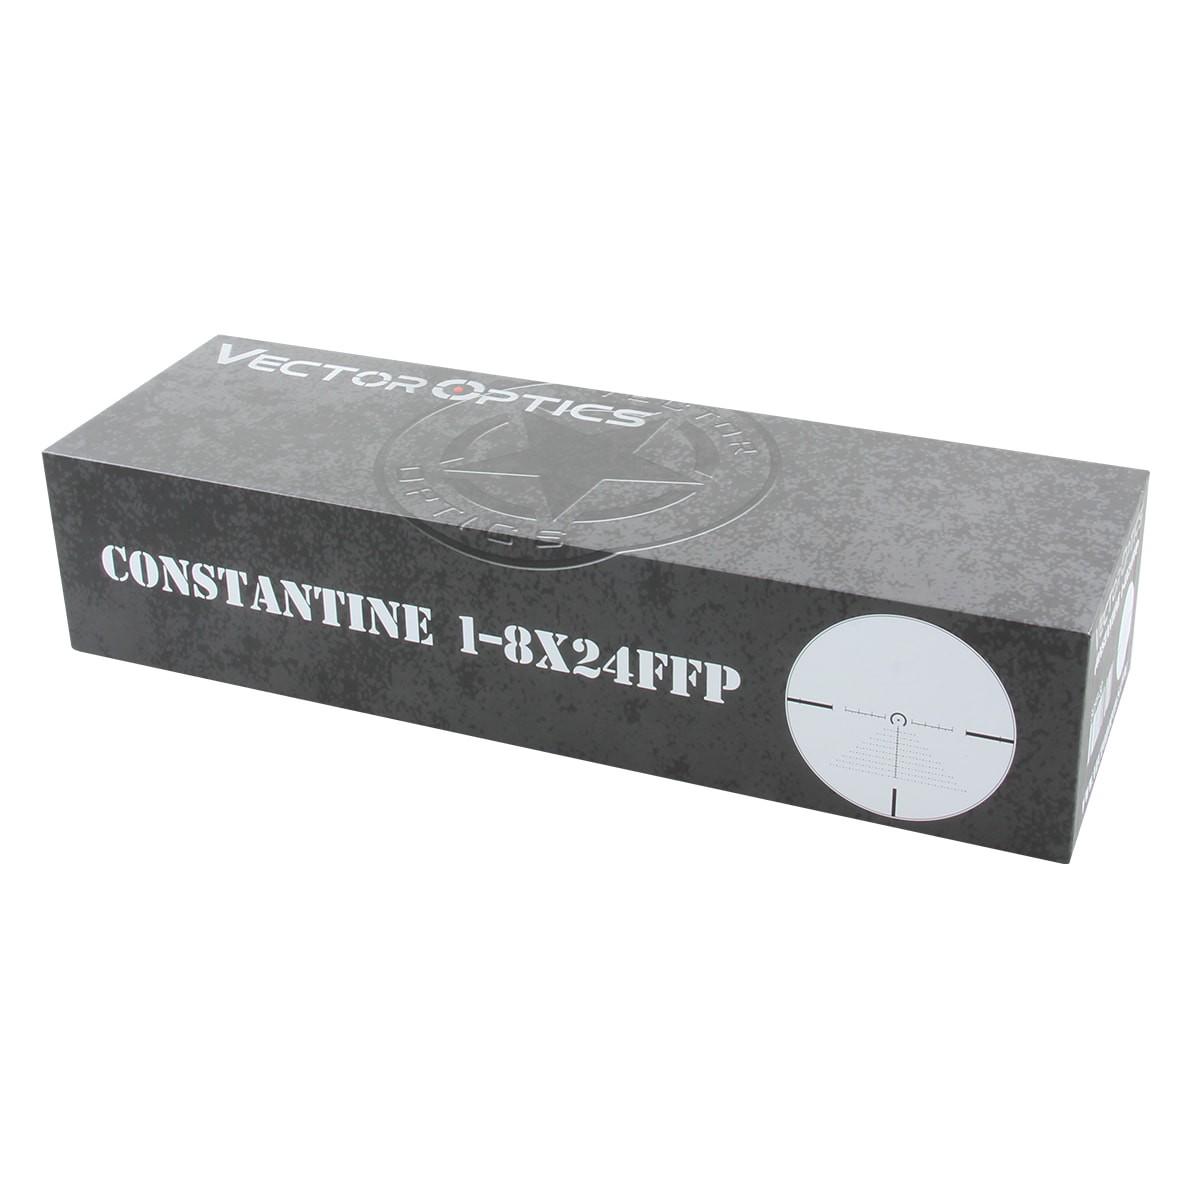 Constantine 1-8x24 FFP Riflescope